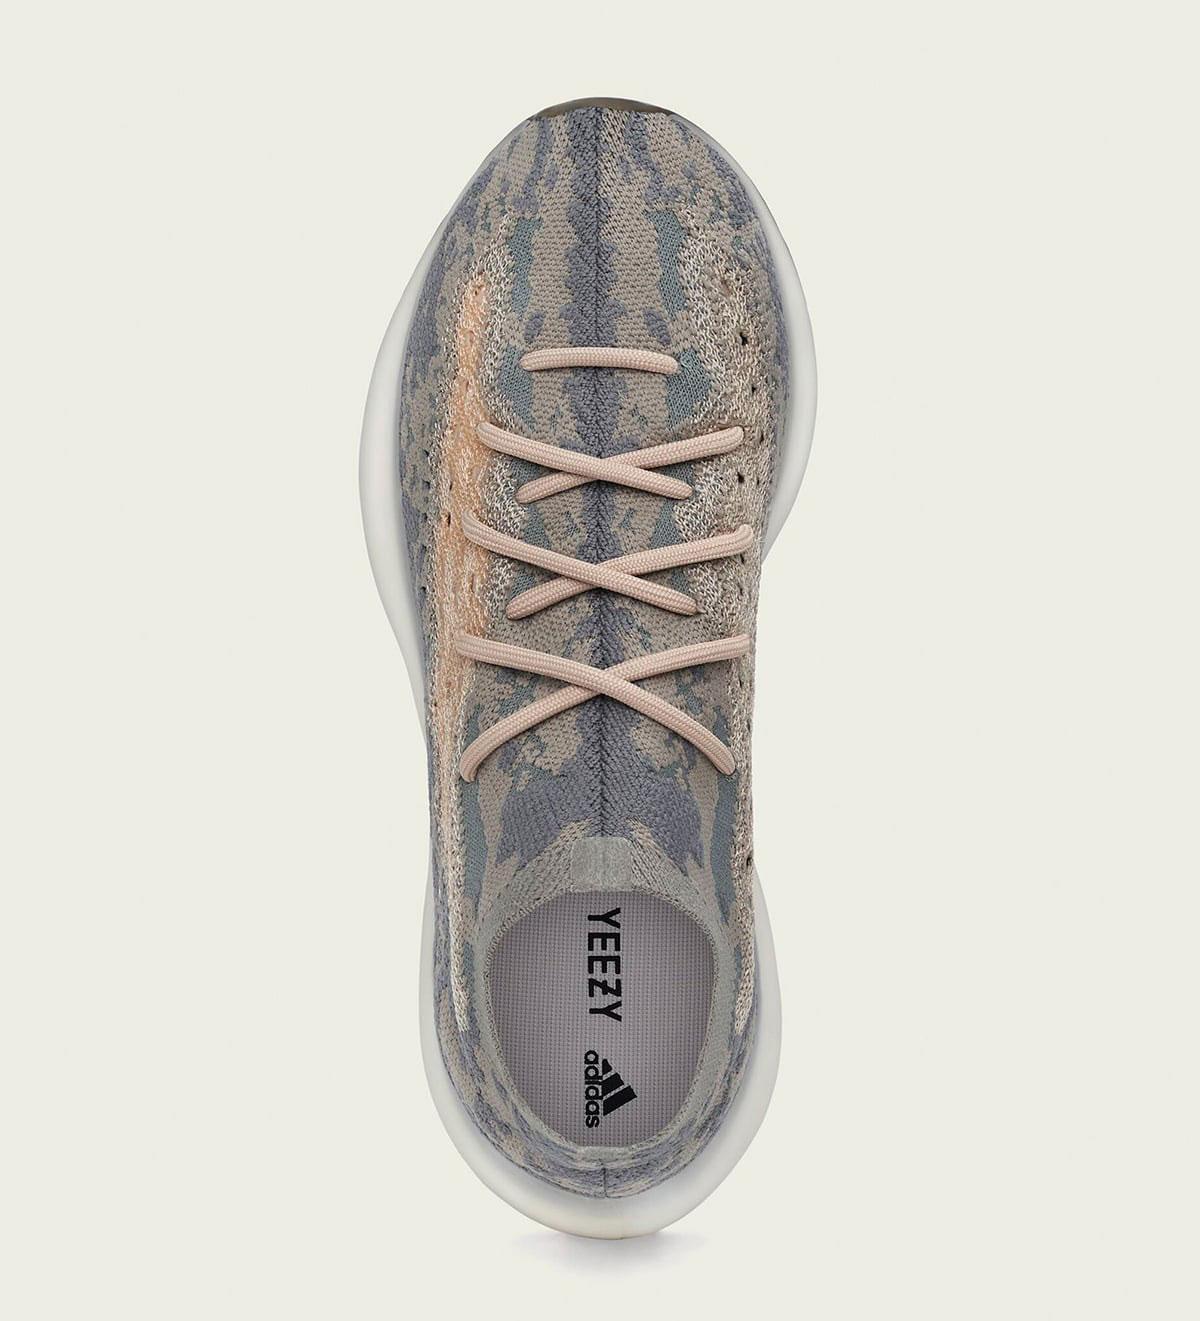 yeezy-boost-380-mist-release-date-price-3